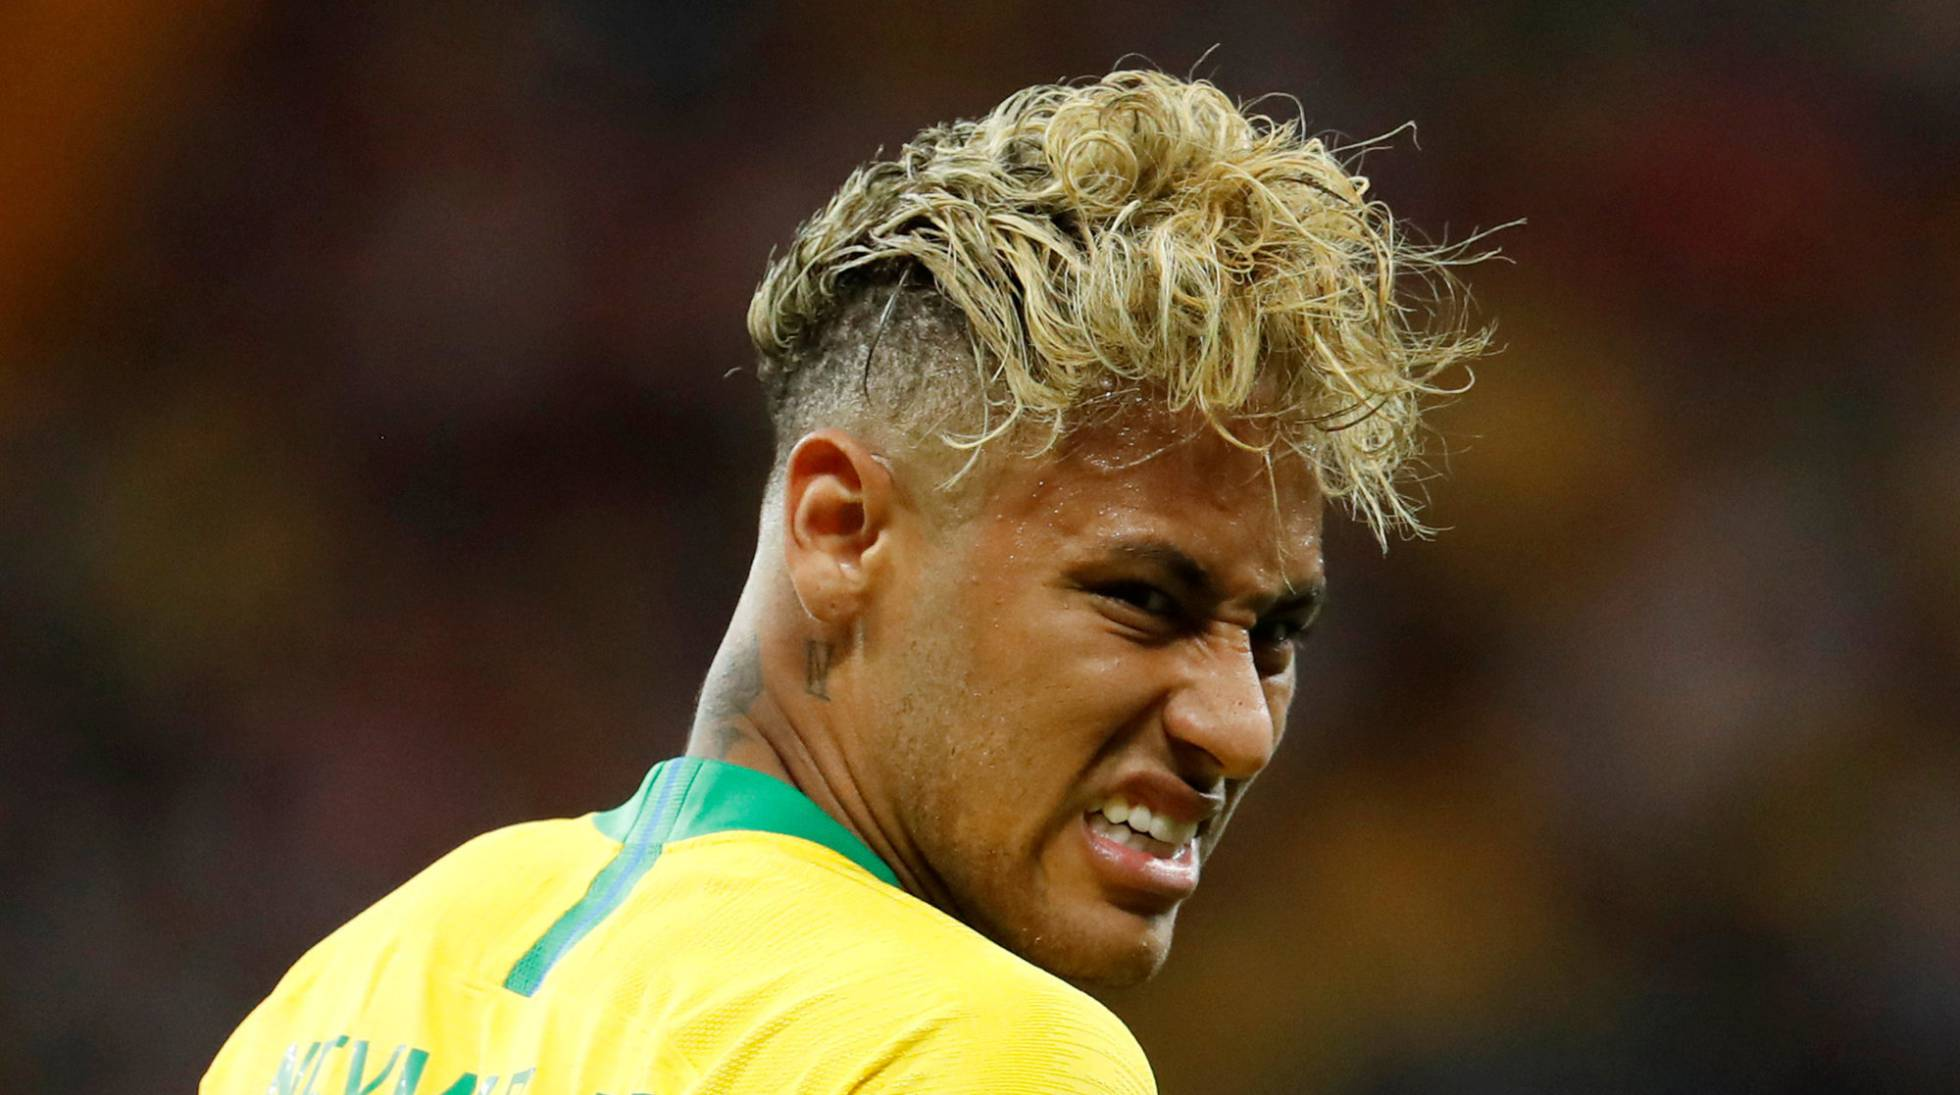 penteado de Neymar